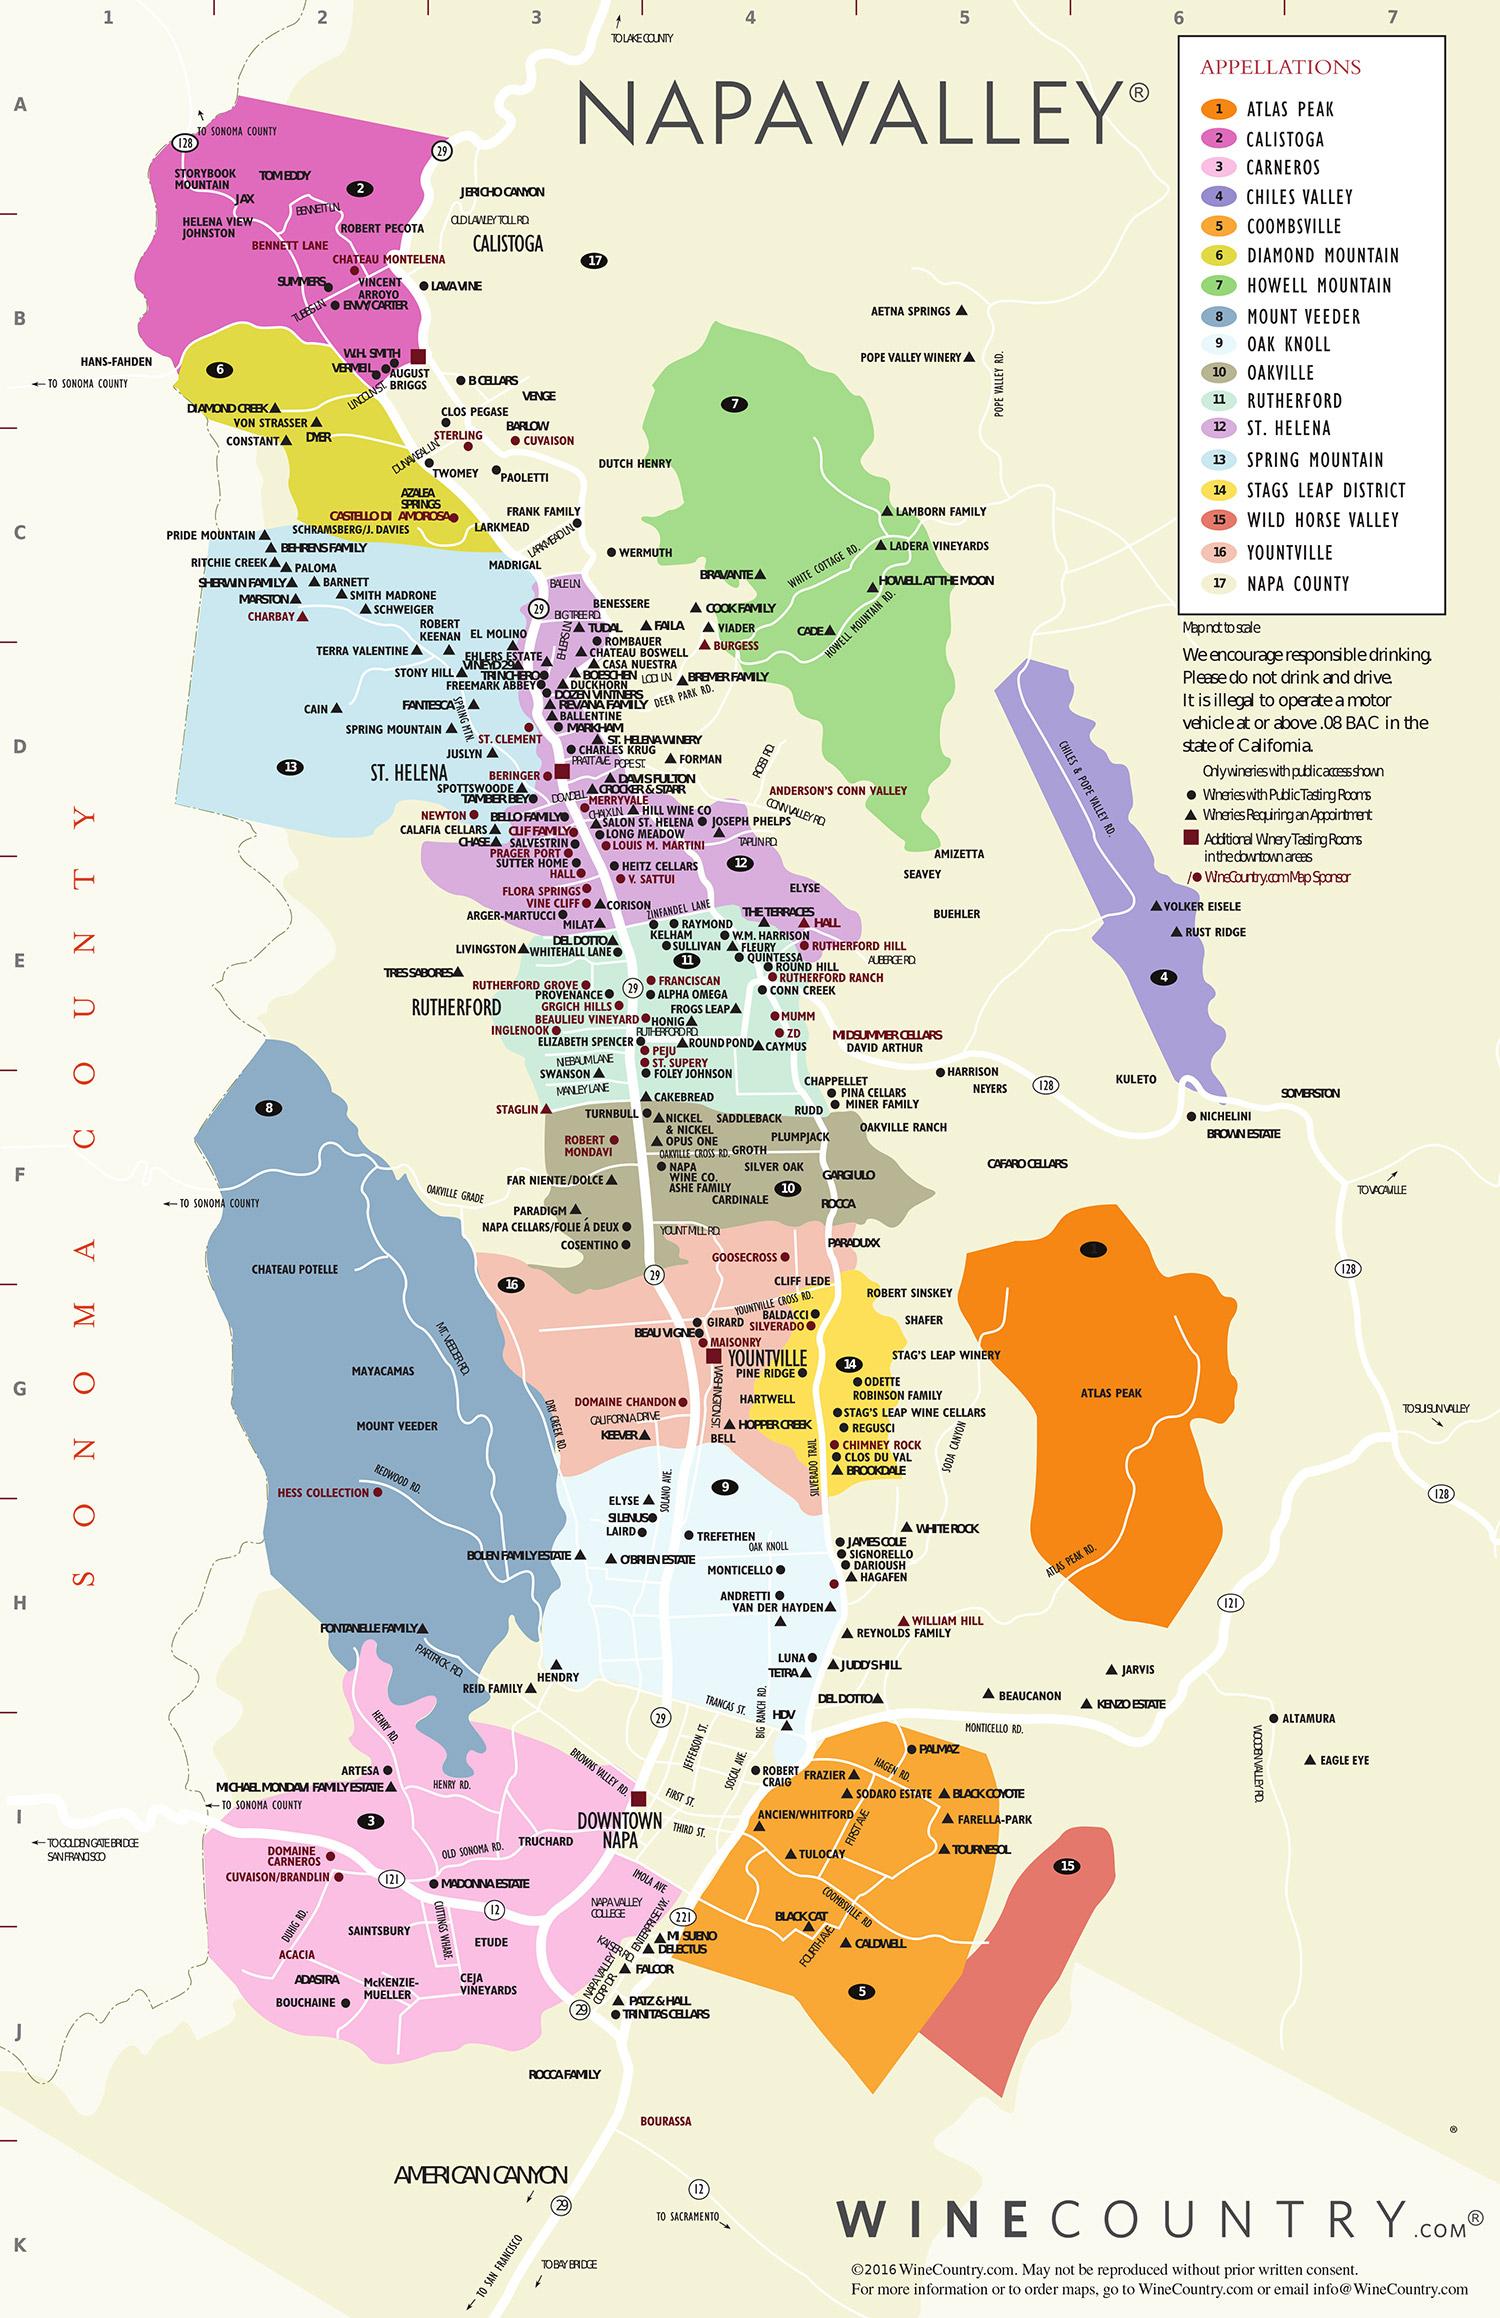 Napa Valley Wine Country Maps - Napavalley - Napa California Map